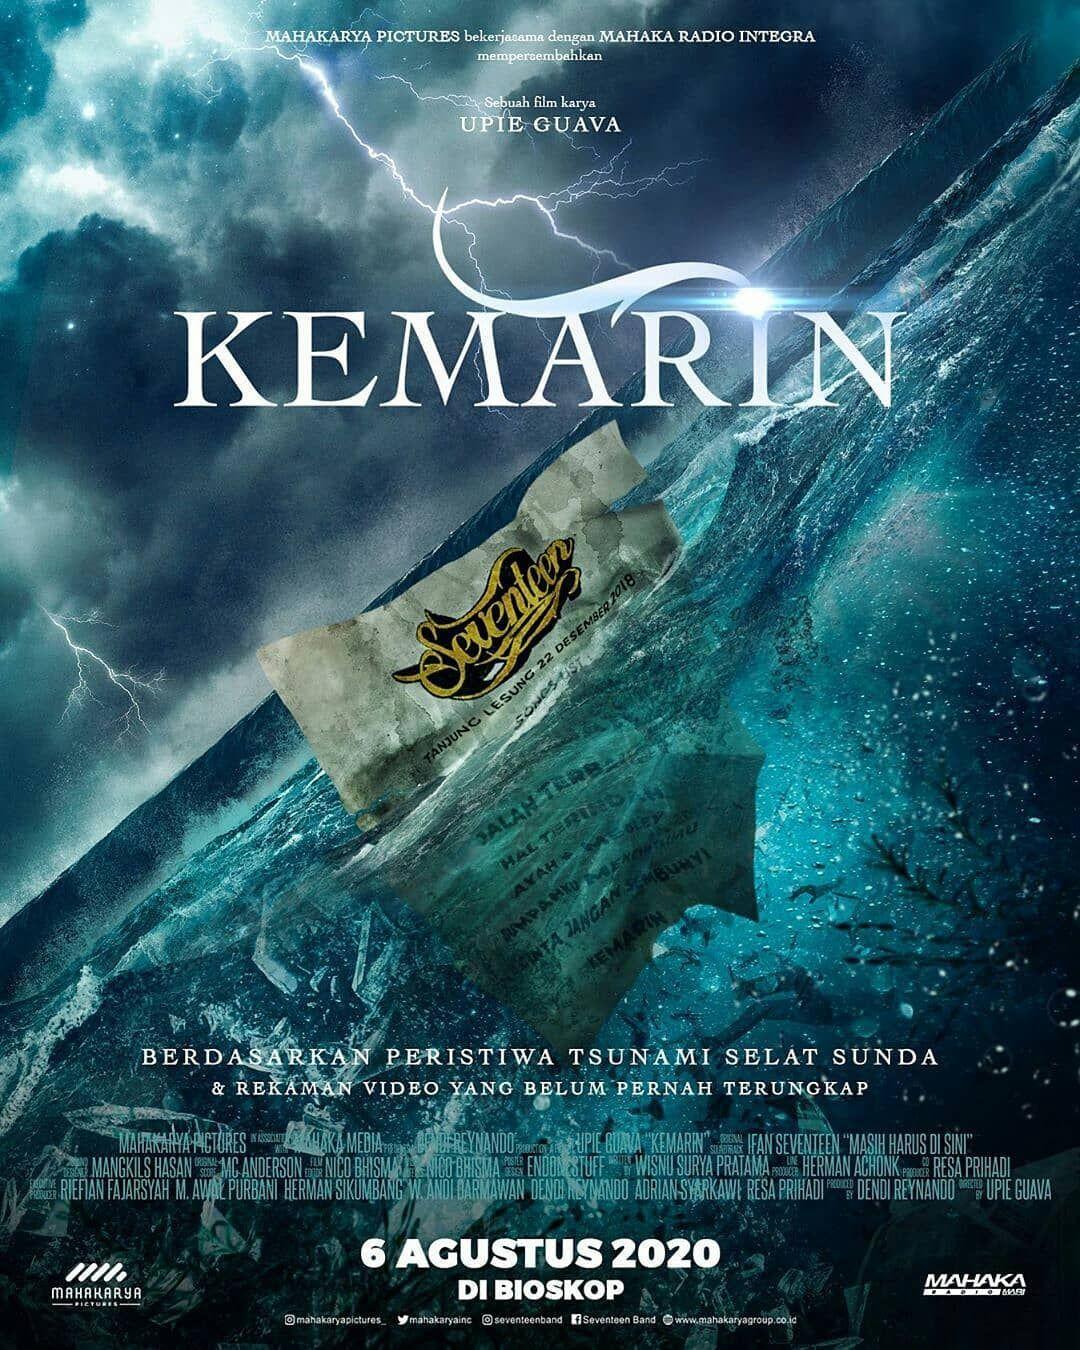 Film Dokumenter Seventeen Hadirkan Rekaman Sebelum Kejadian Tsunami